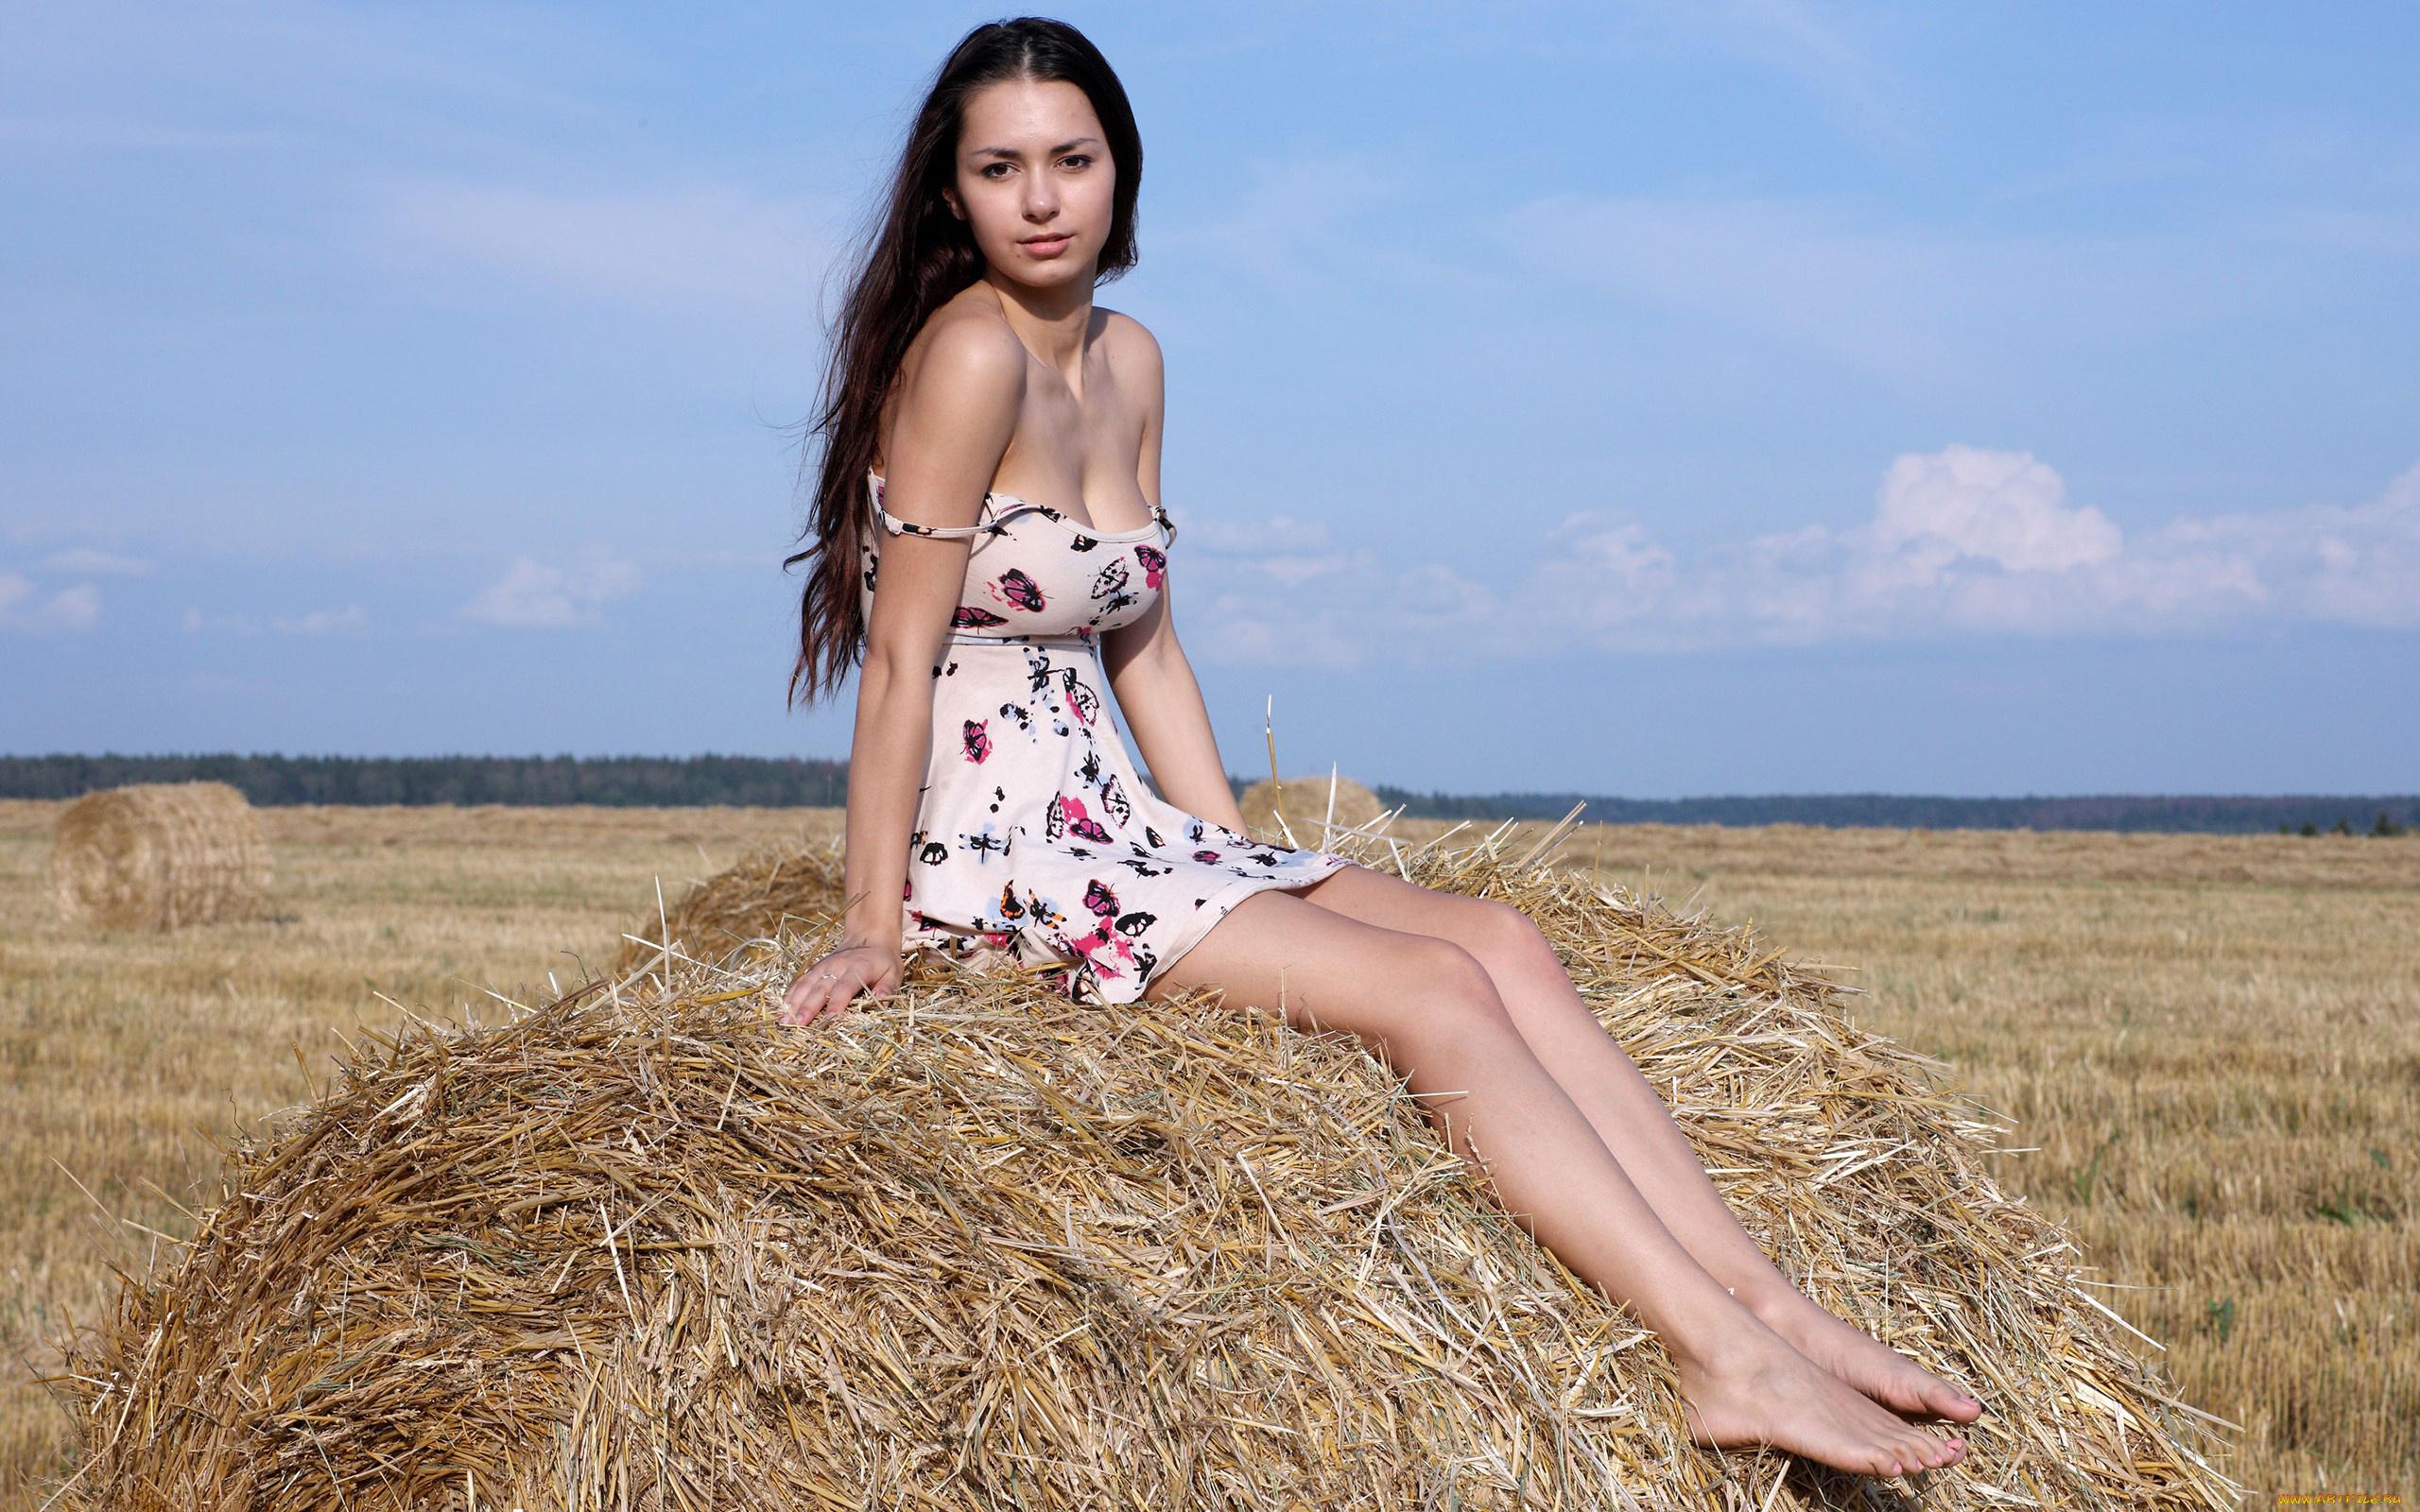 krasivie-derevenskie-devushki-bez-odezhdi-na-prirode